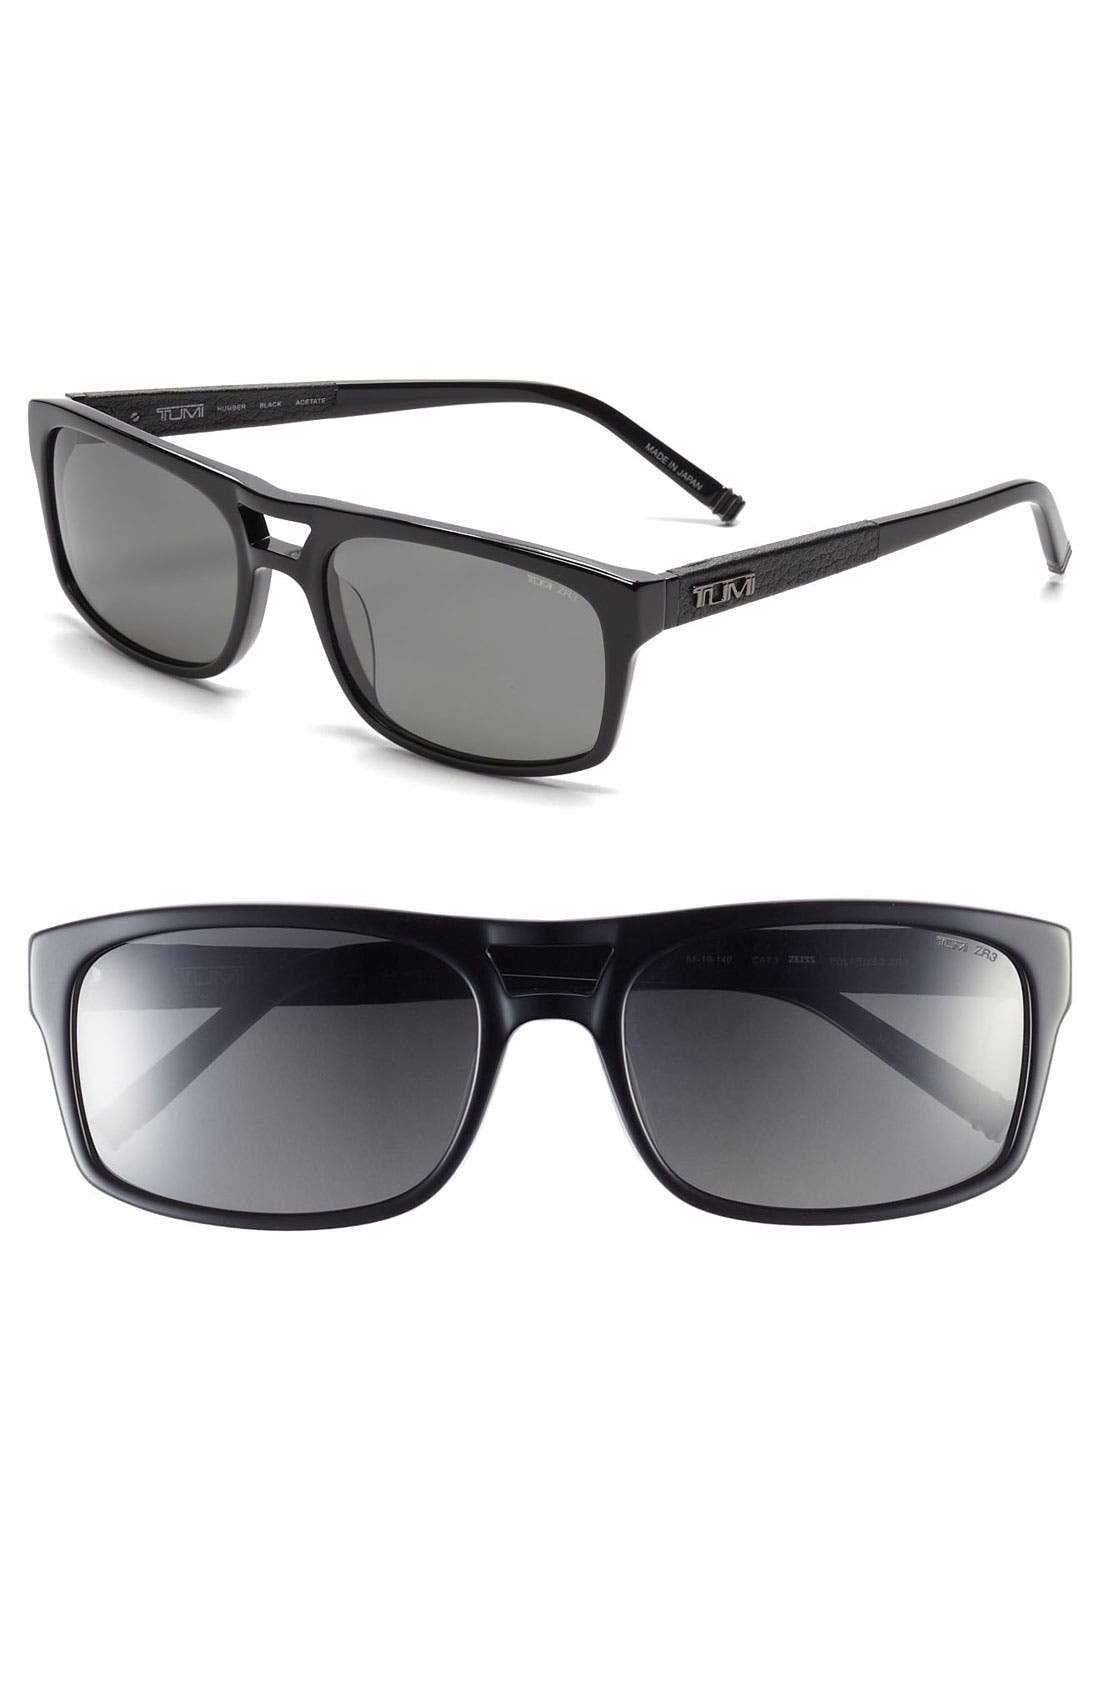 Main Image - Tumi 'Humber' 58mm Polarized Sunglasses